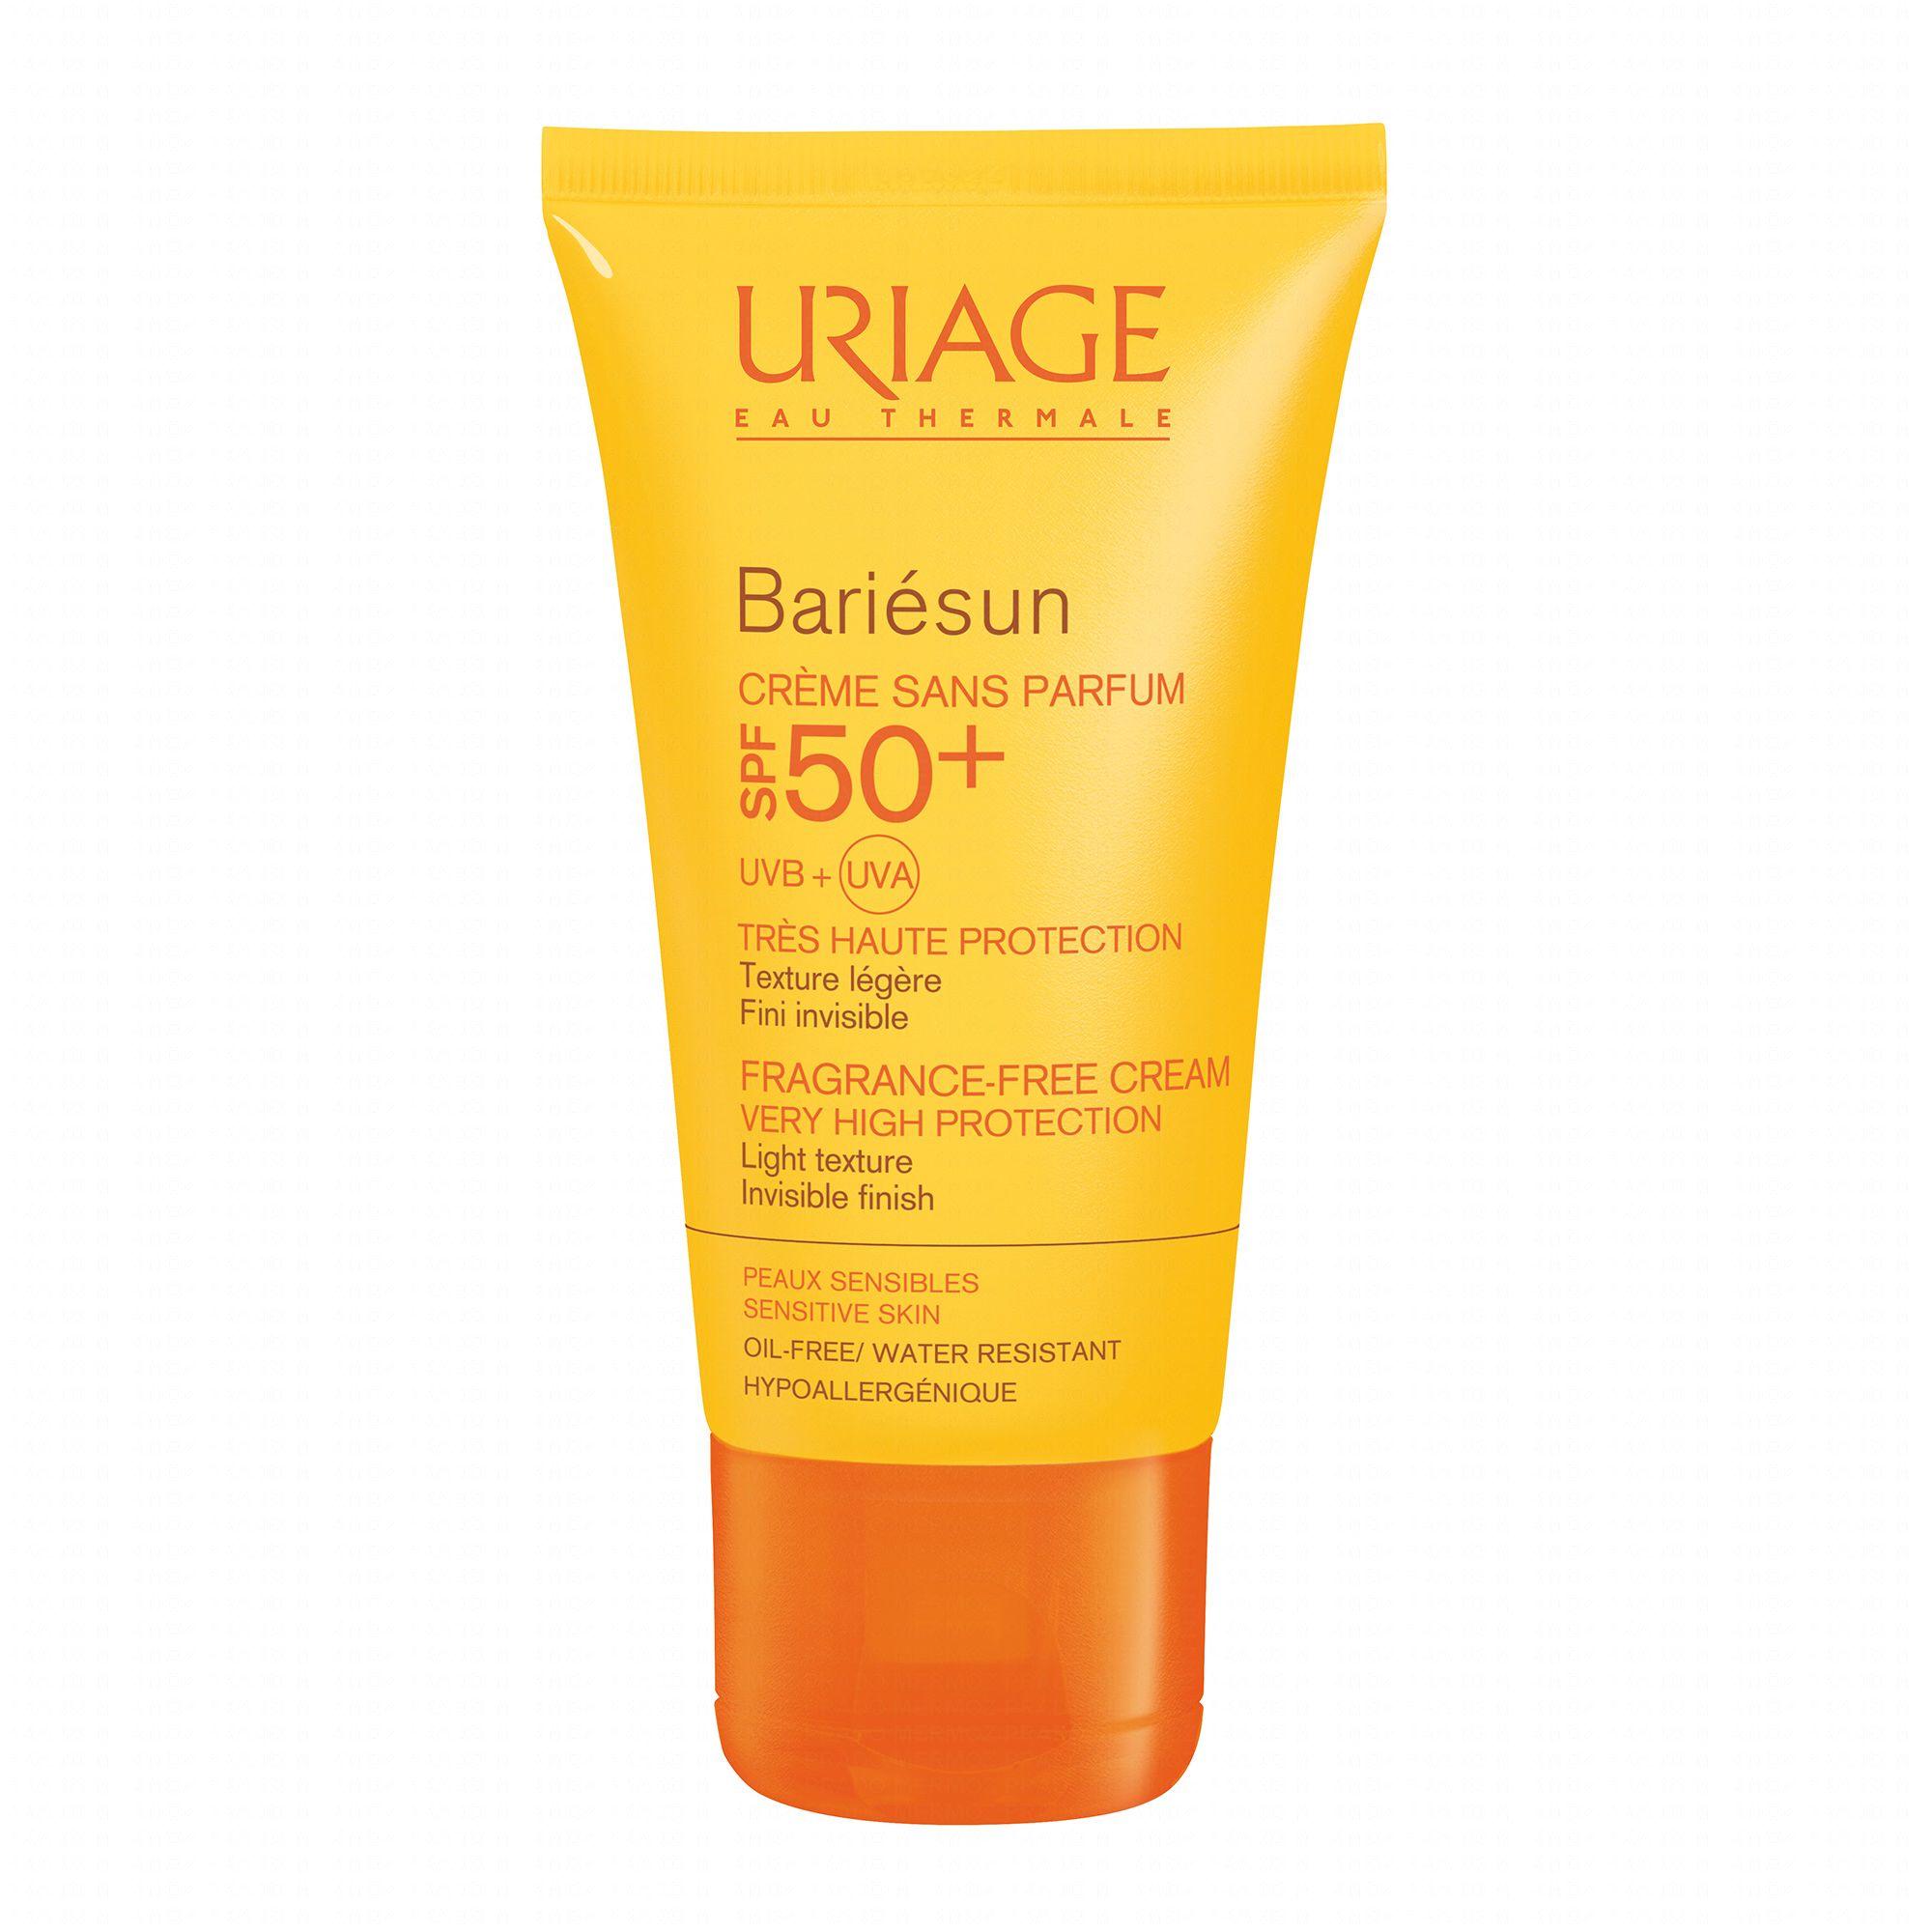 uriage barièsun spf50  crème sans parfum 50ml